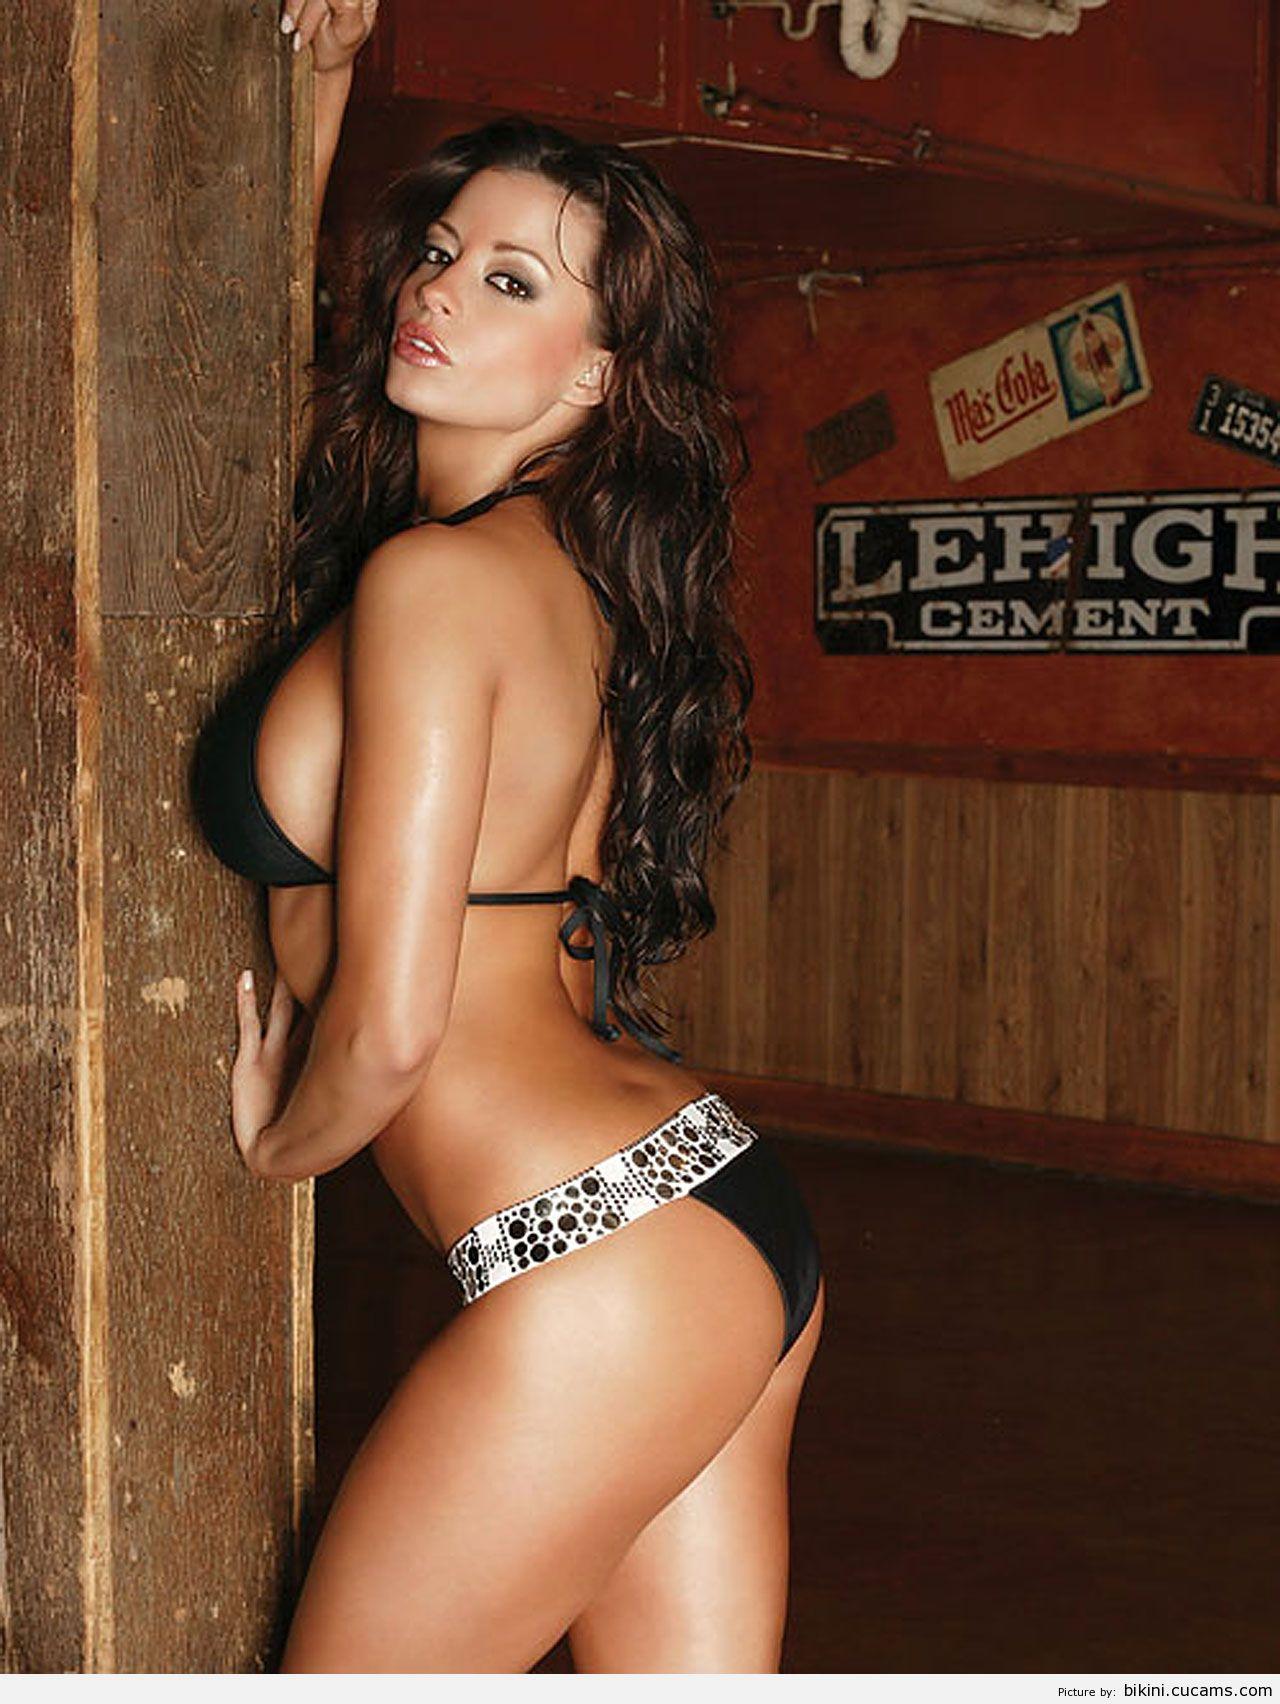 Bikini Torture Photoshoot by bikini.cucams.com